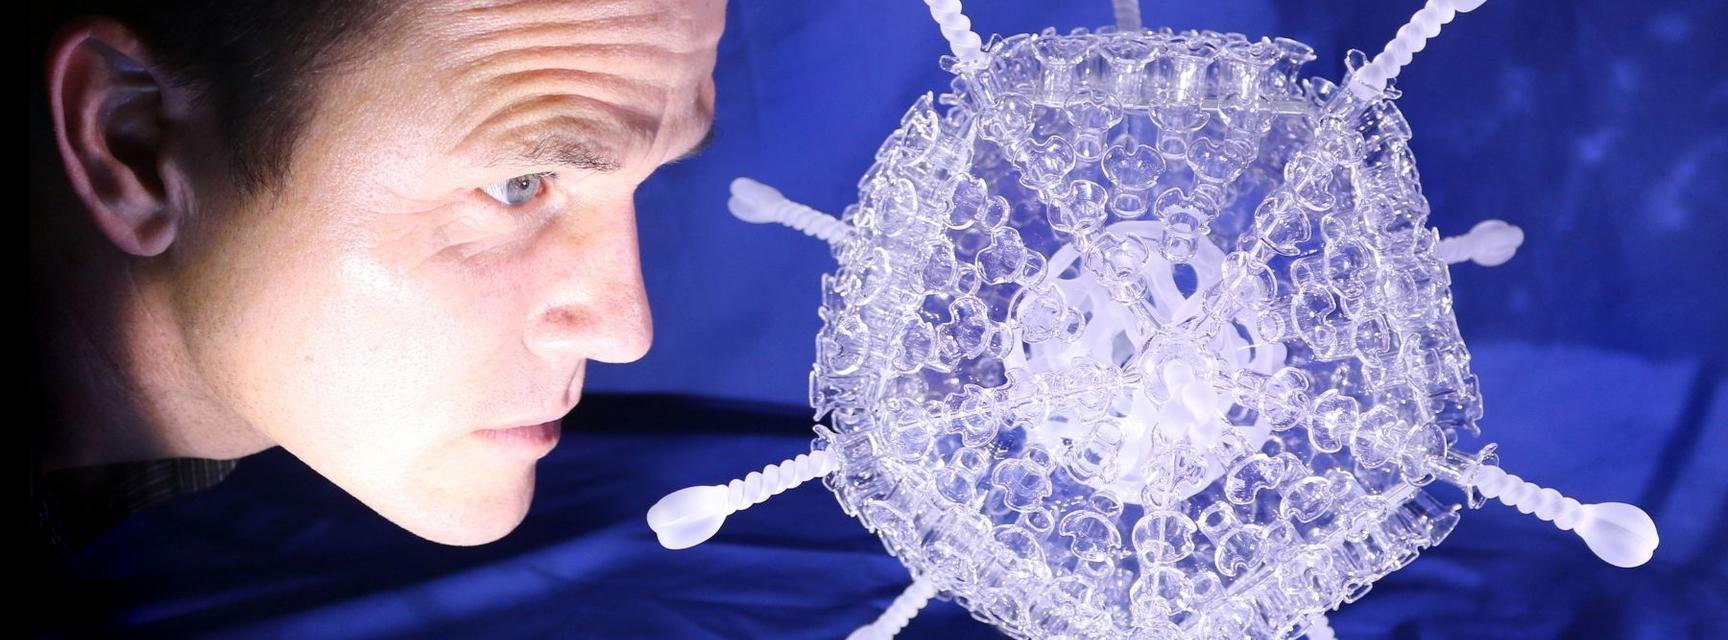 Luke Jerram with his COVID-19 vaccine glass sculpture